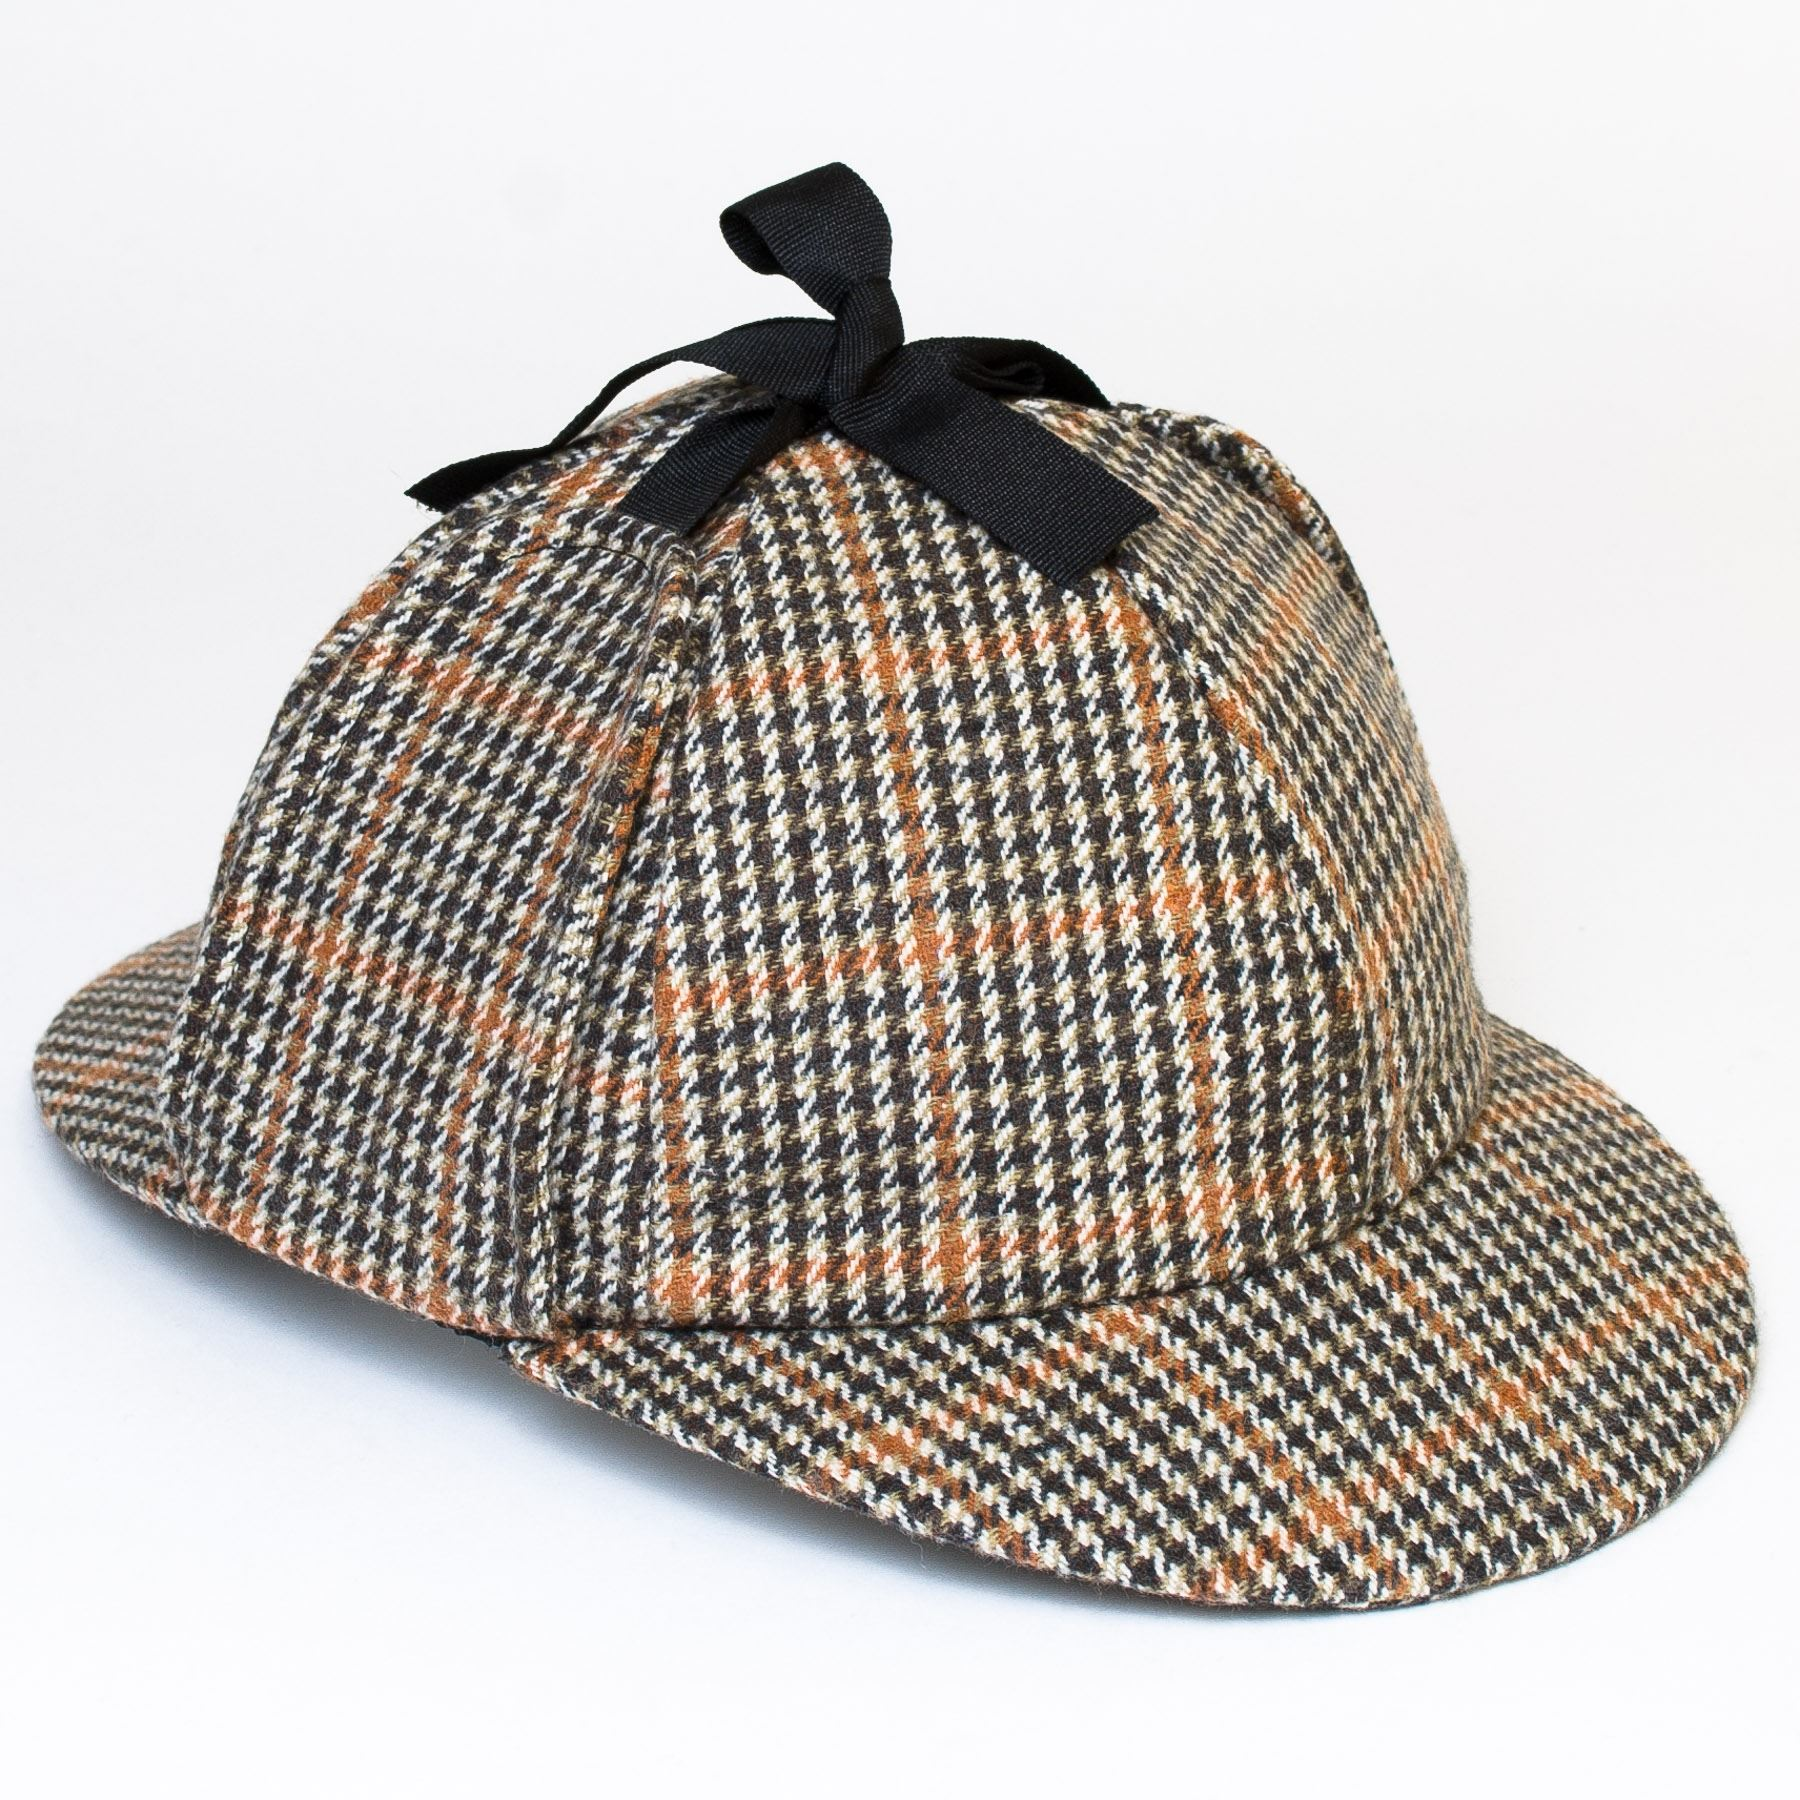 Wool Blend Sherlock Holmes Style Hat with Black Ribbon